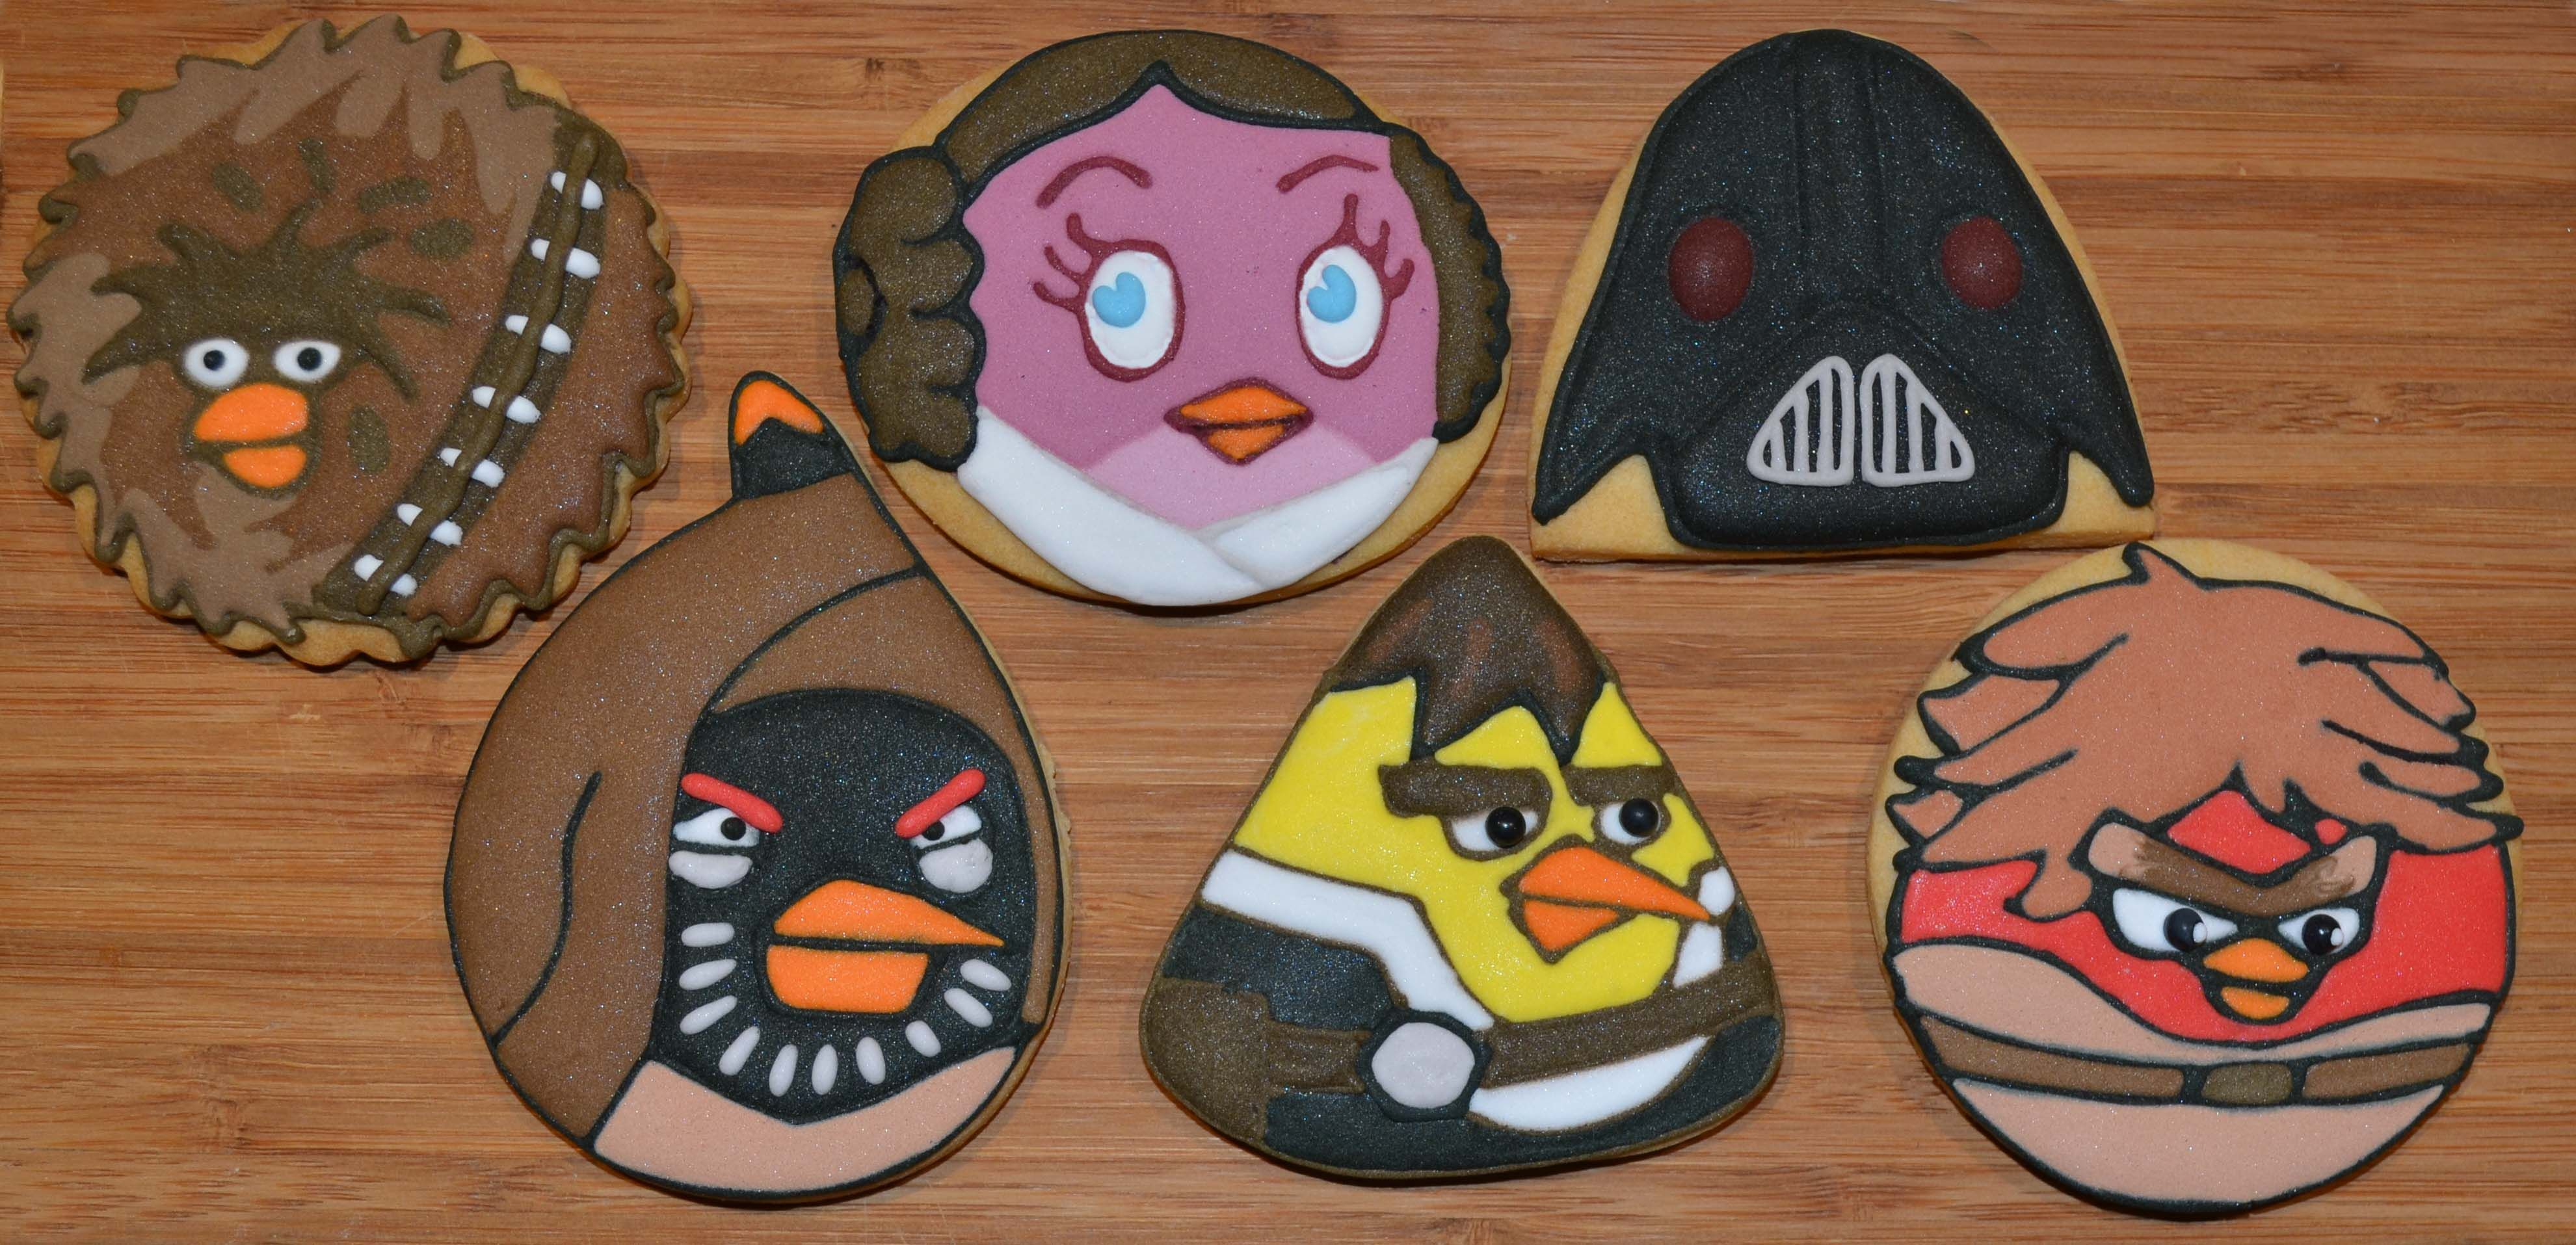 Star Wars Angry Bird Cookies